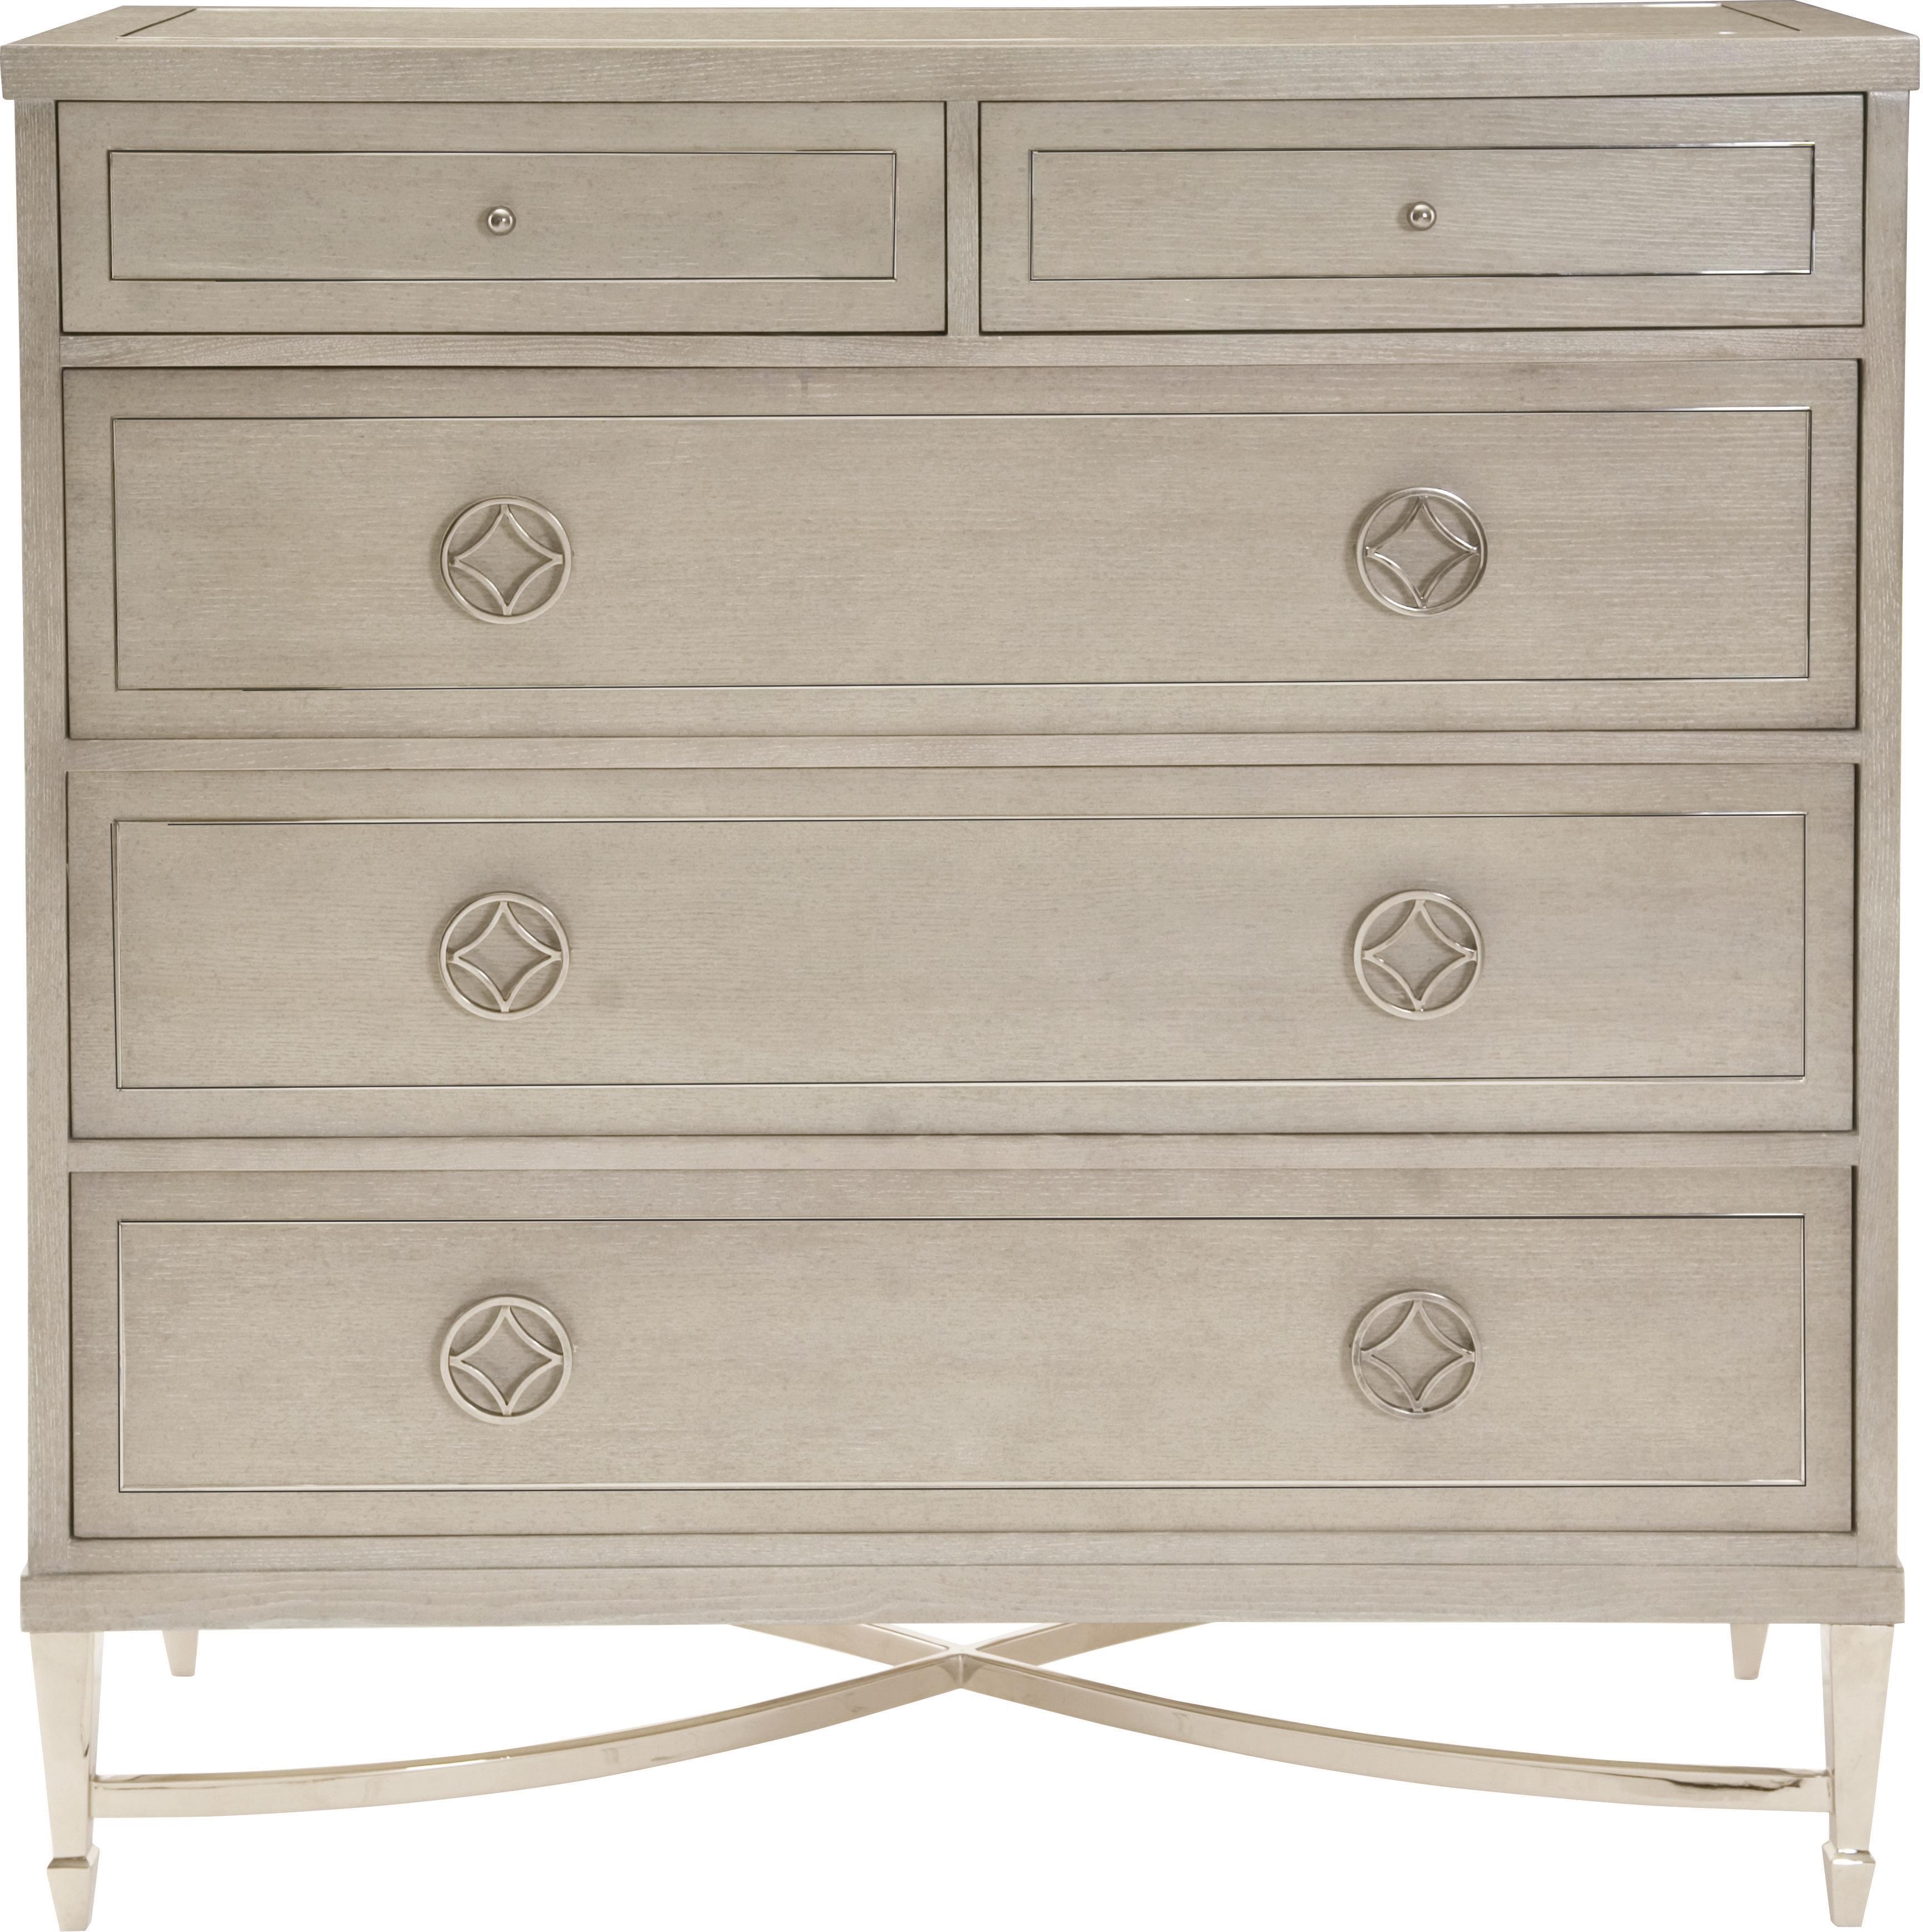 Criteria Drawer Chest by Bernhardt at Baer's Furniture